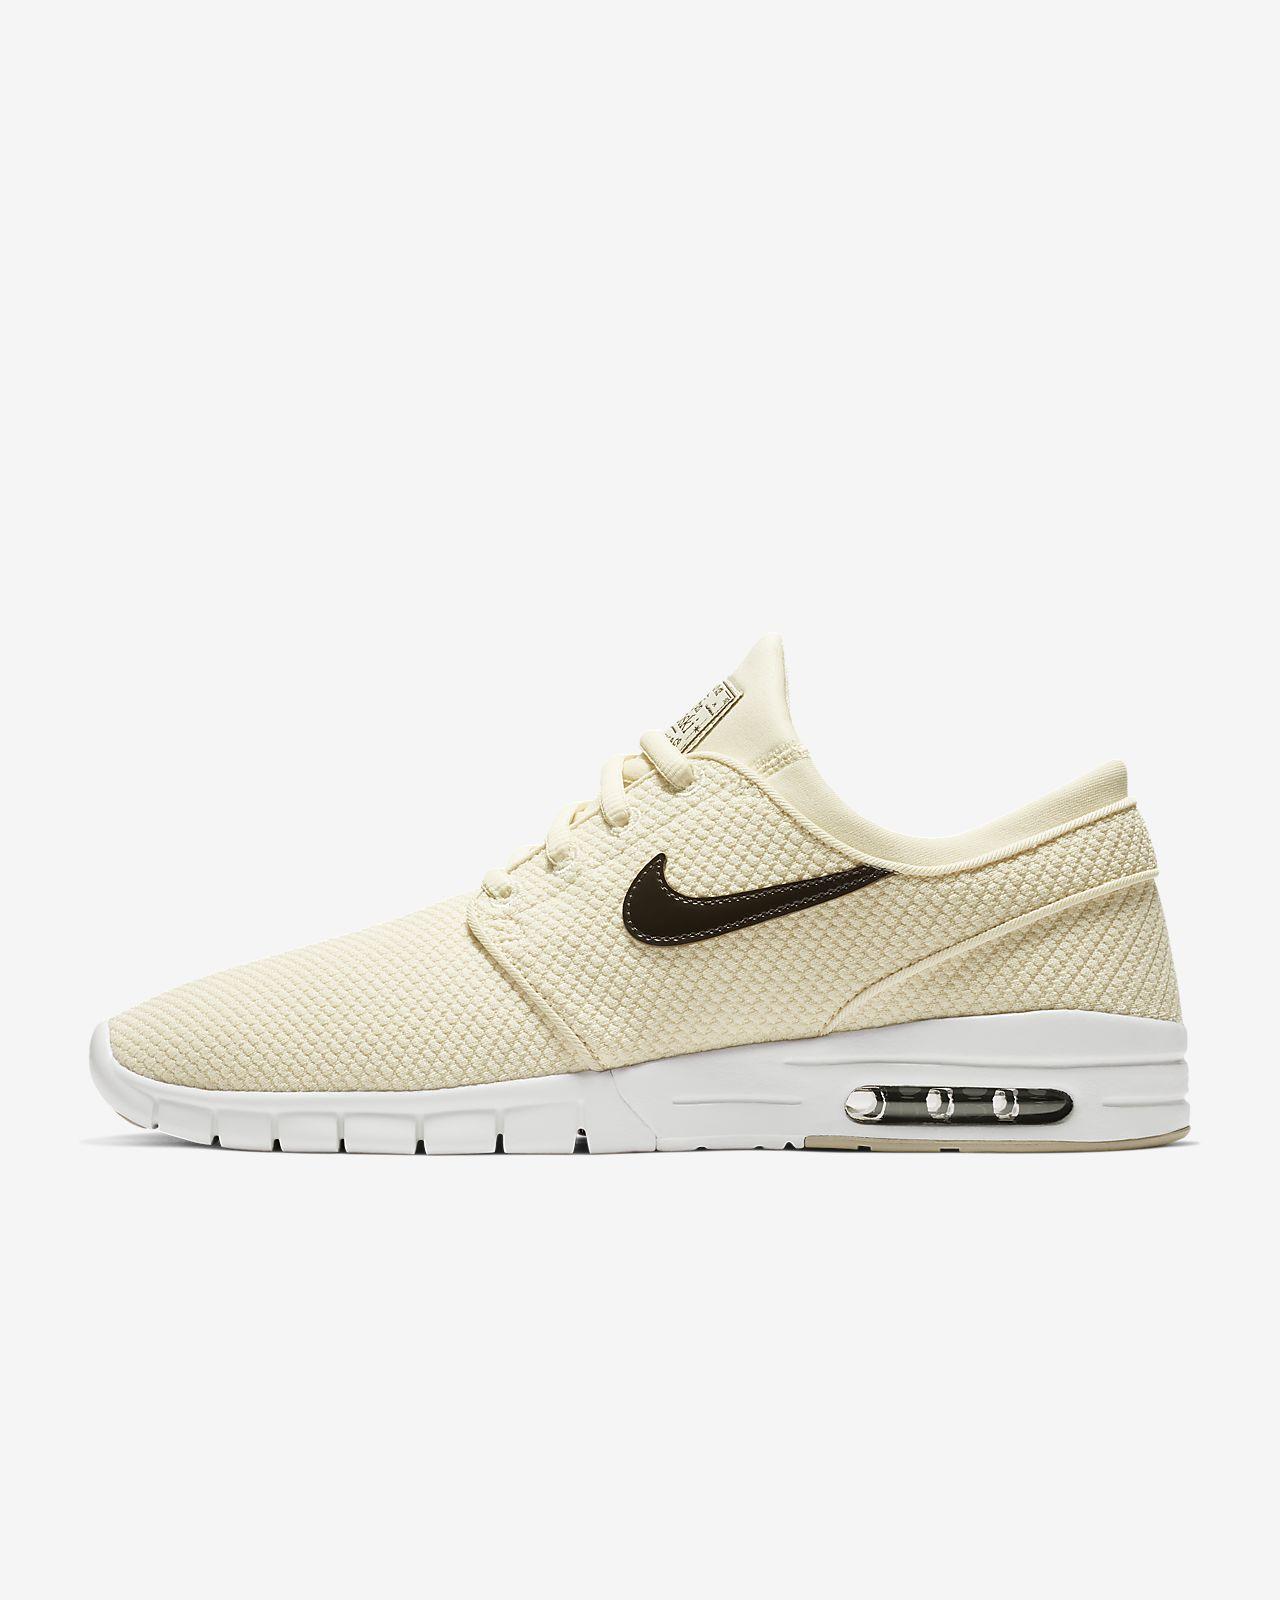 new product 415b9 7a0ea ... Skatesko Nike SB Stefan Janoski Max